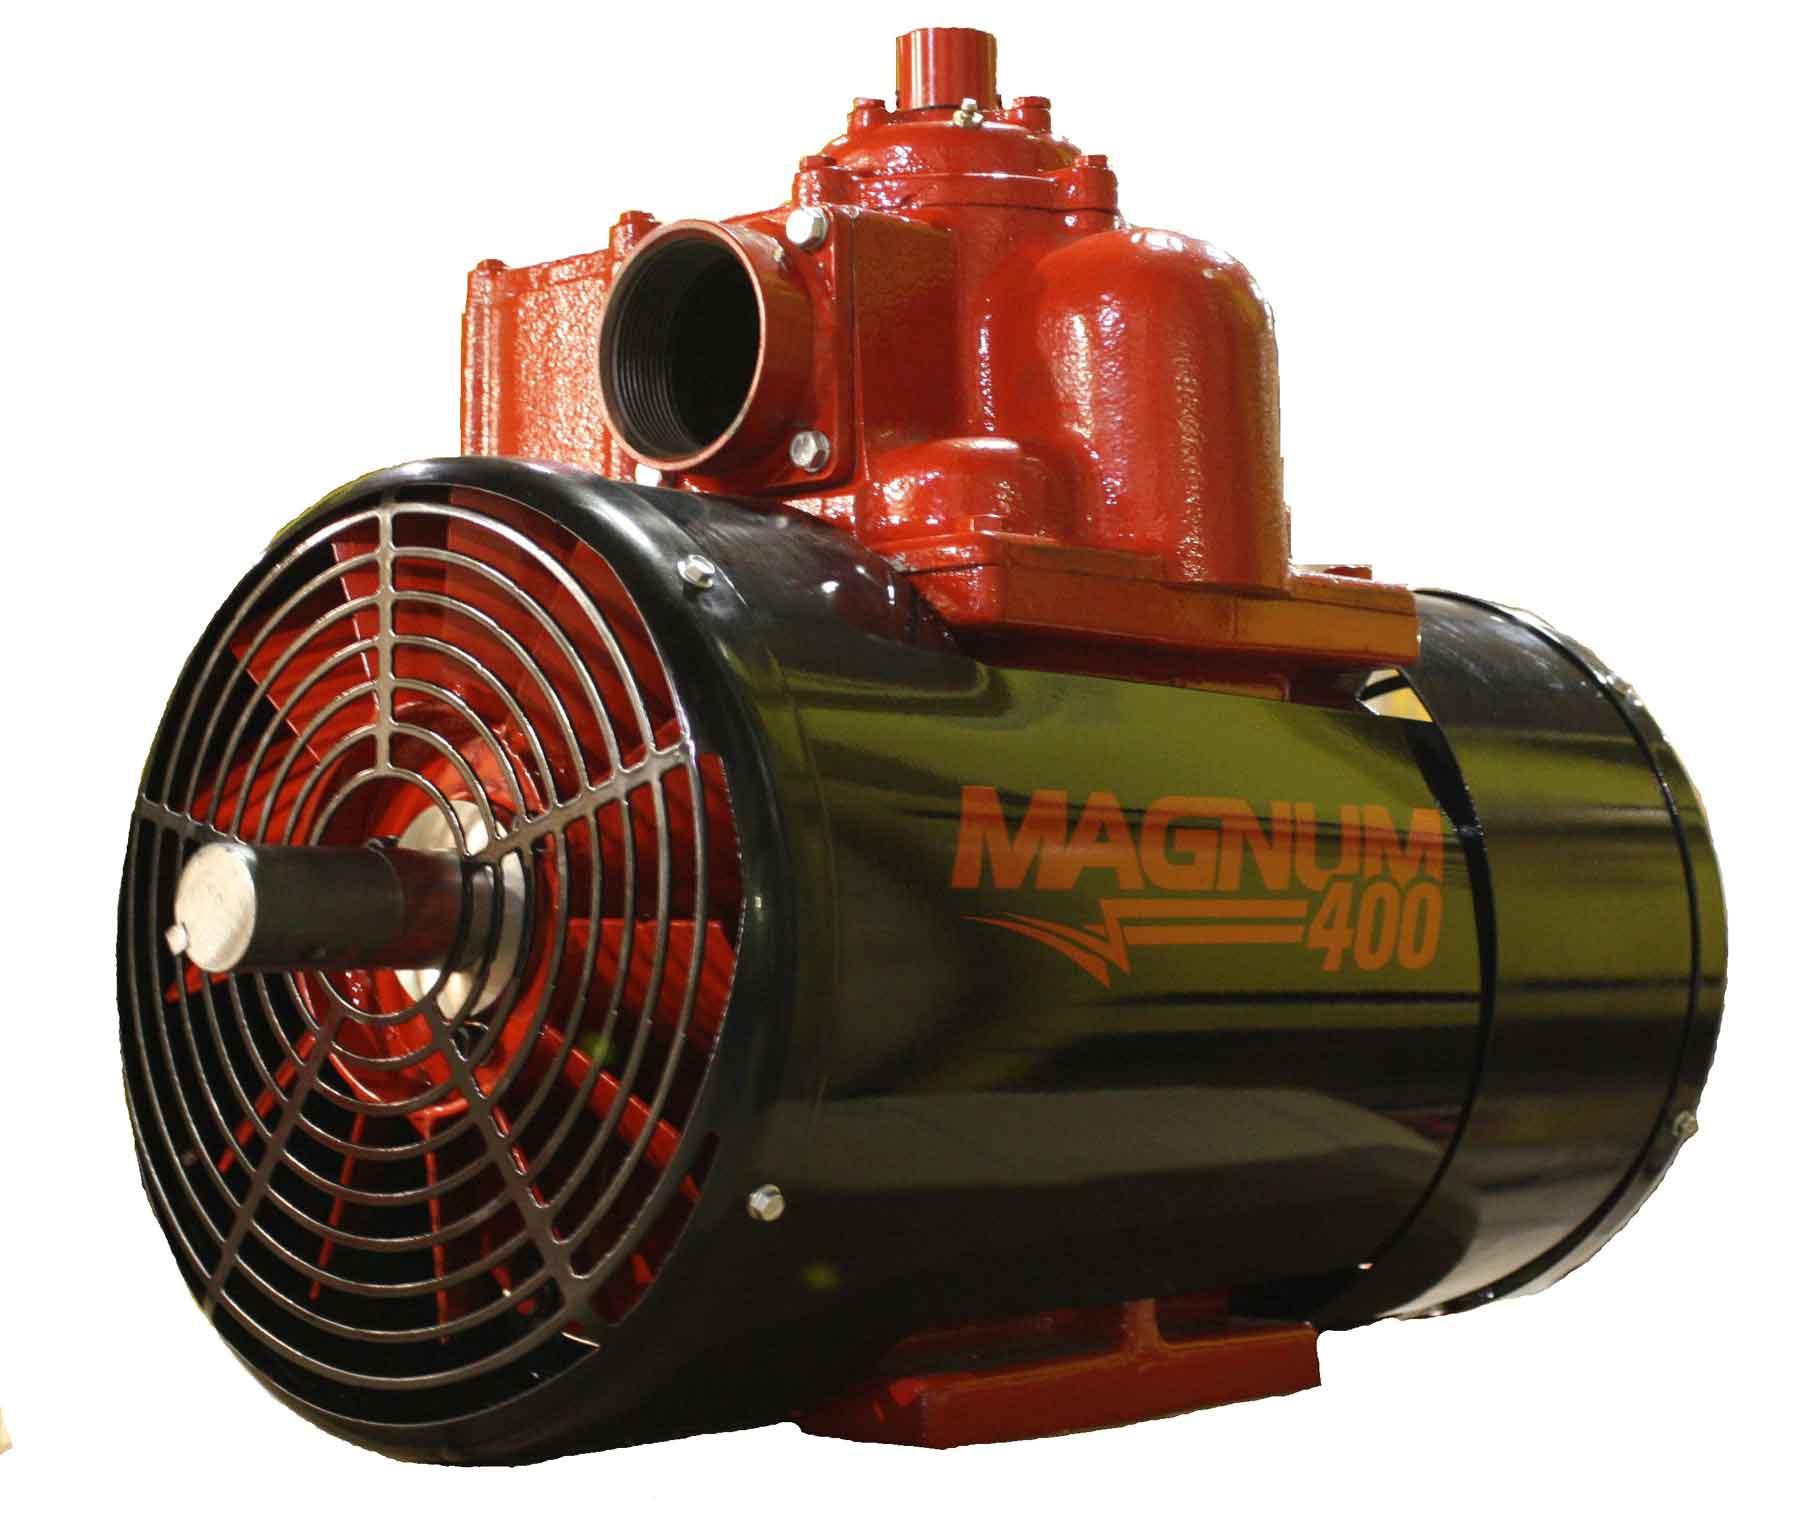 Magnum 400 Vacuum Pump by Nuhn Industries